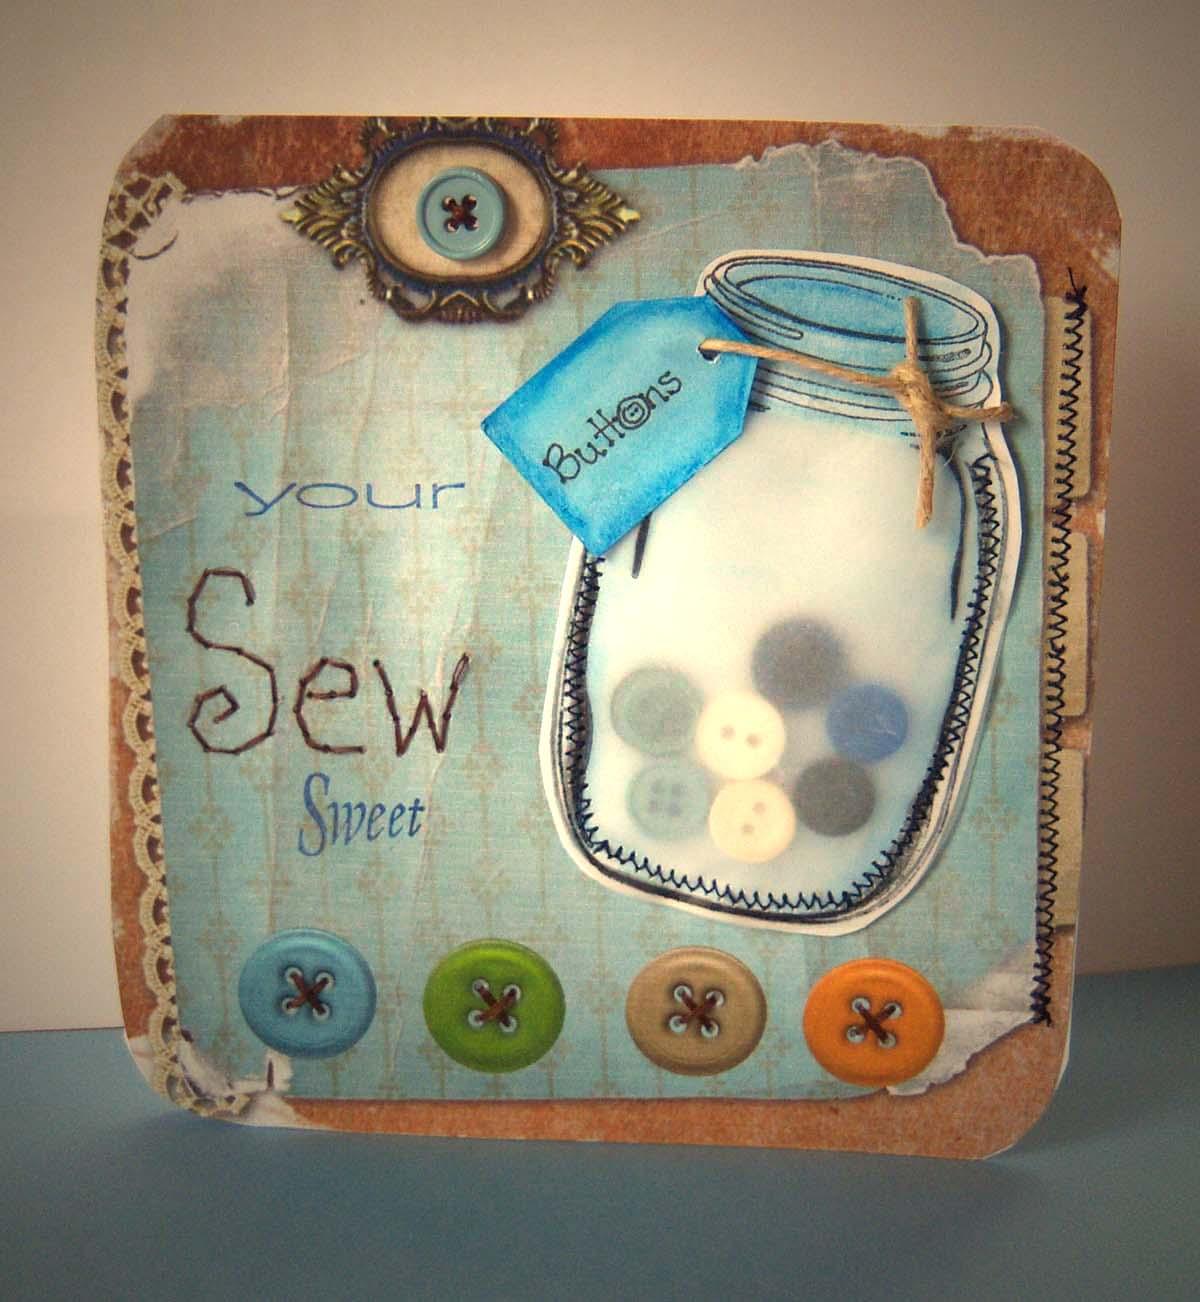 http://4.bp.blogspot.com/-D1ewFrKbTB0/Tp9V2aMsqjI/AAAAAAAAEM4/DBQIV2e4CZk/s1600/friendship+5+copy.jpg